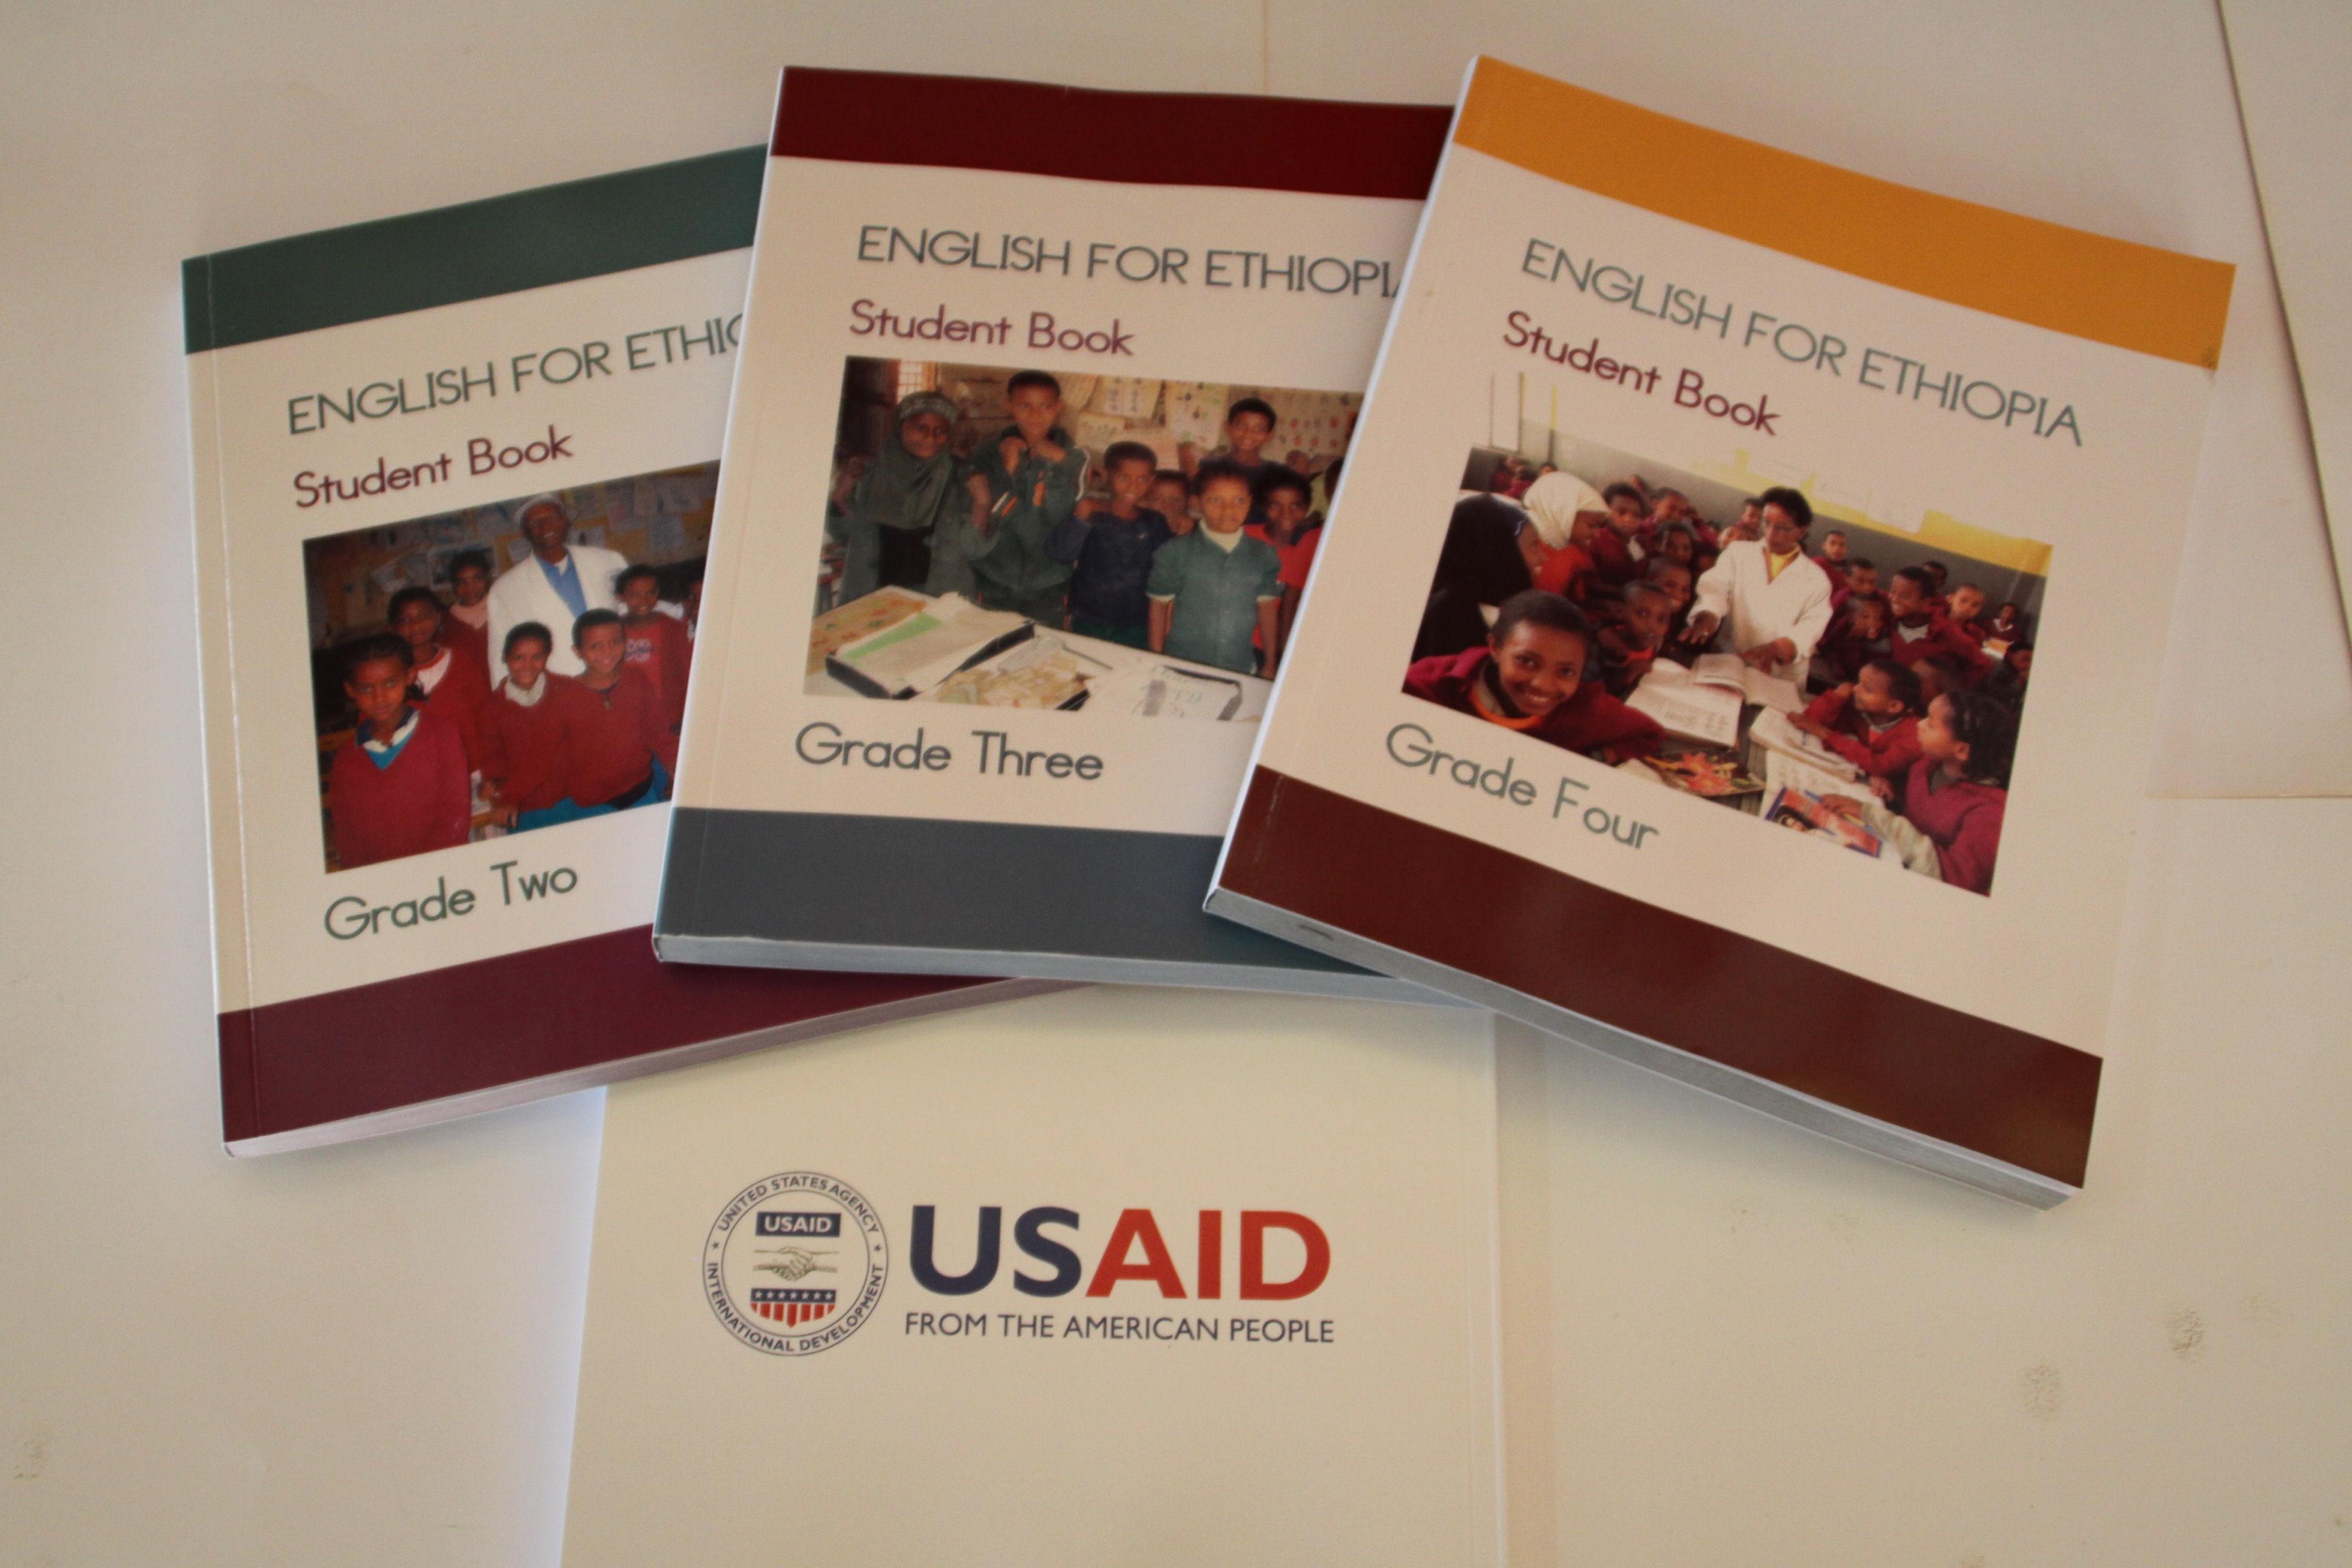 New Textbooks to Help Ethiopian Students Improve English